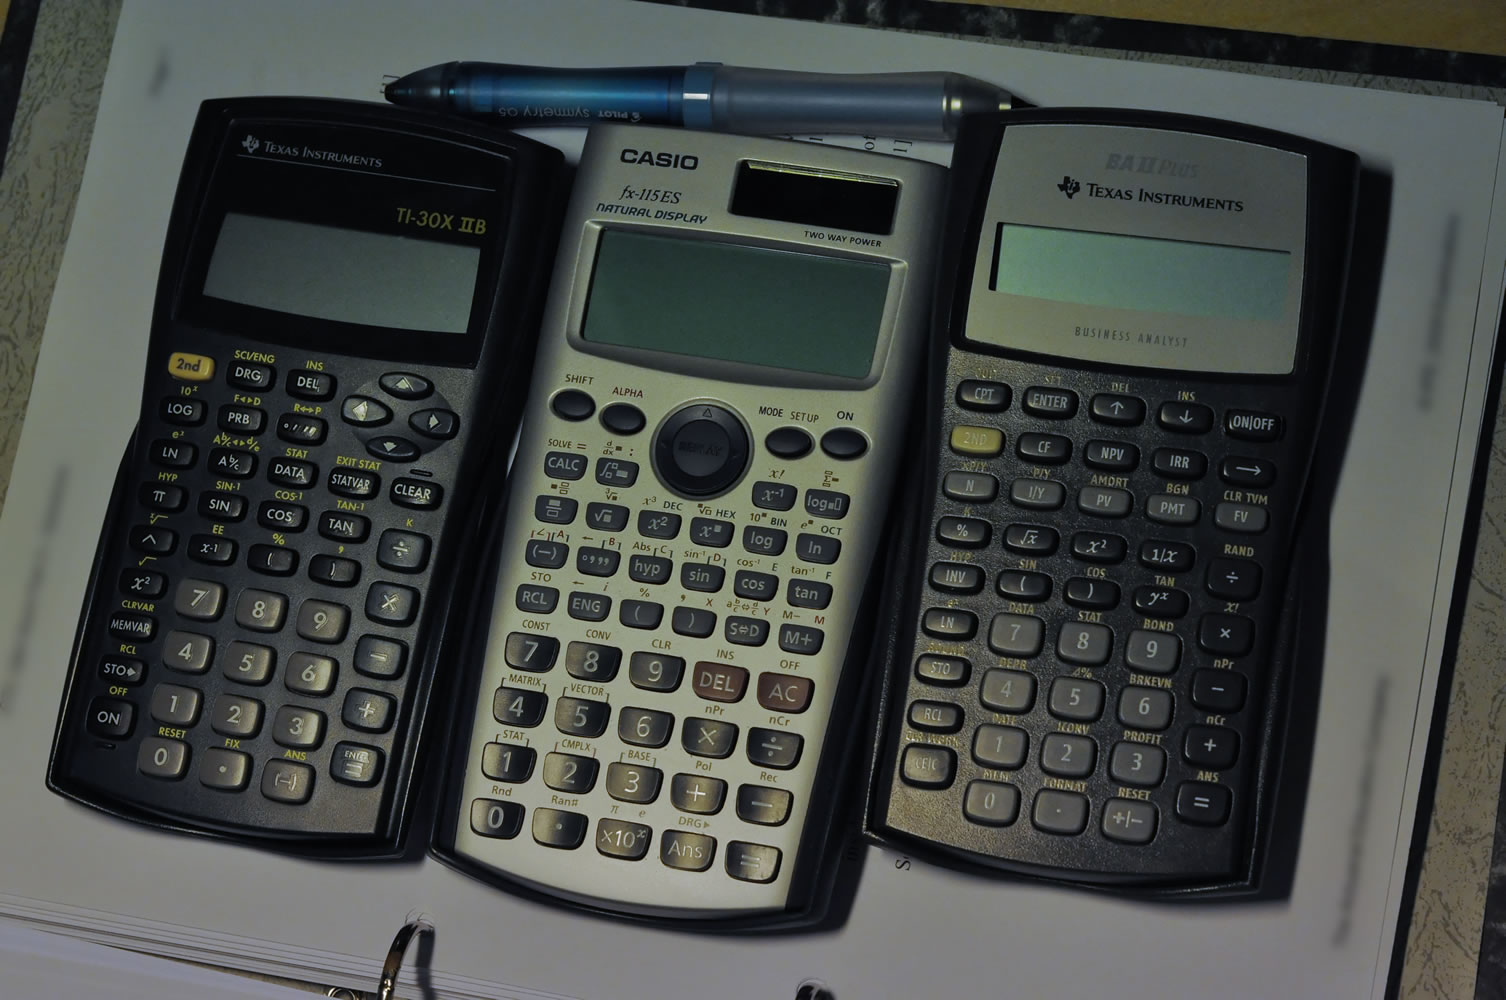 TI-30X IIB, Casio fx-115ES, TI BA II Plus